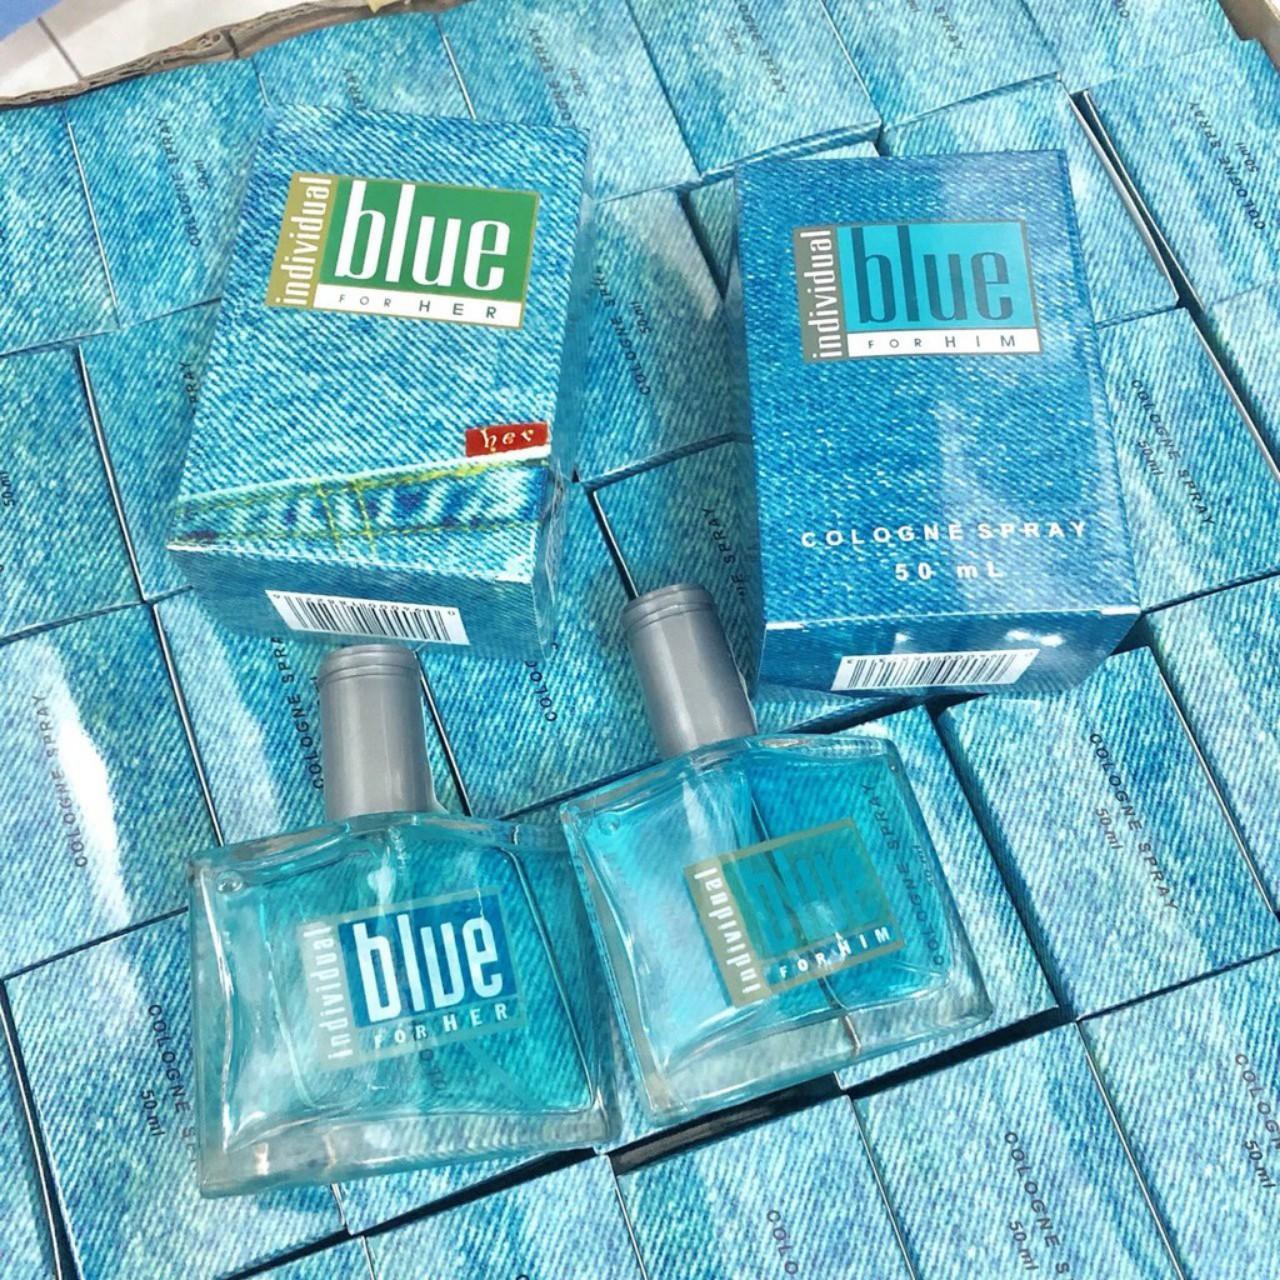 Nước Hoa Nam - Nữ Blue Pour Sud Individual 50ml